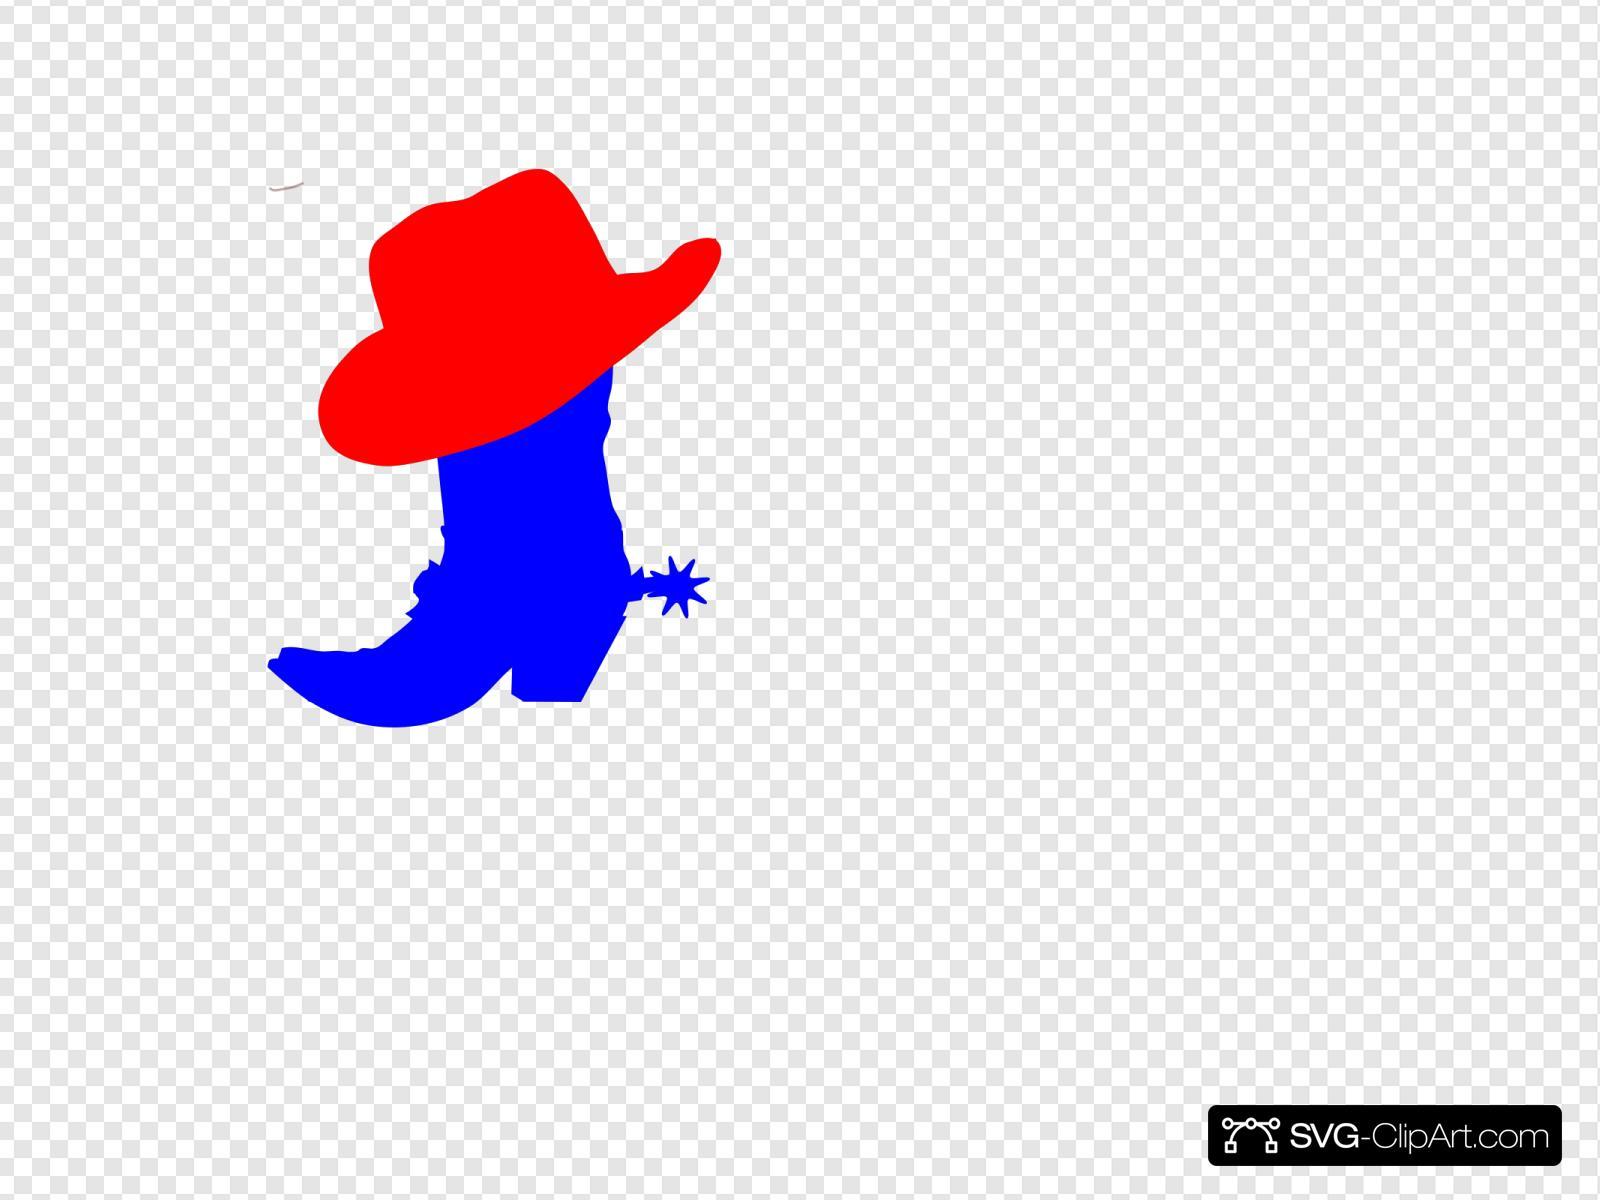 Cowboy hat svg. Red clip art icon